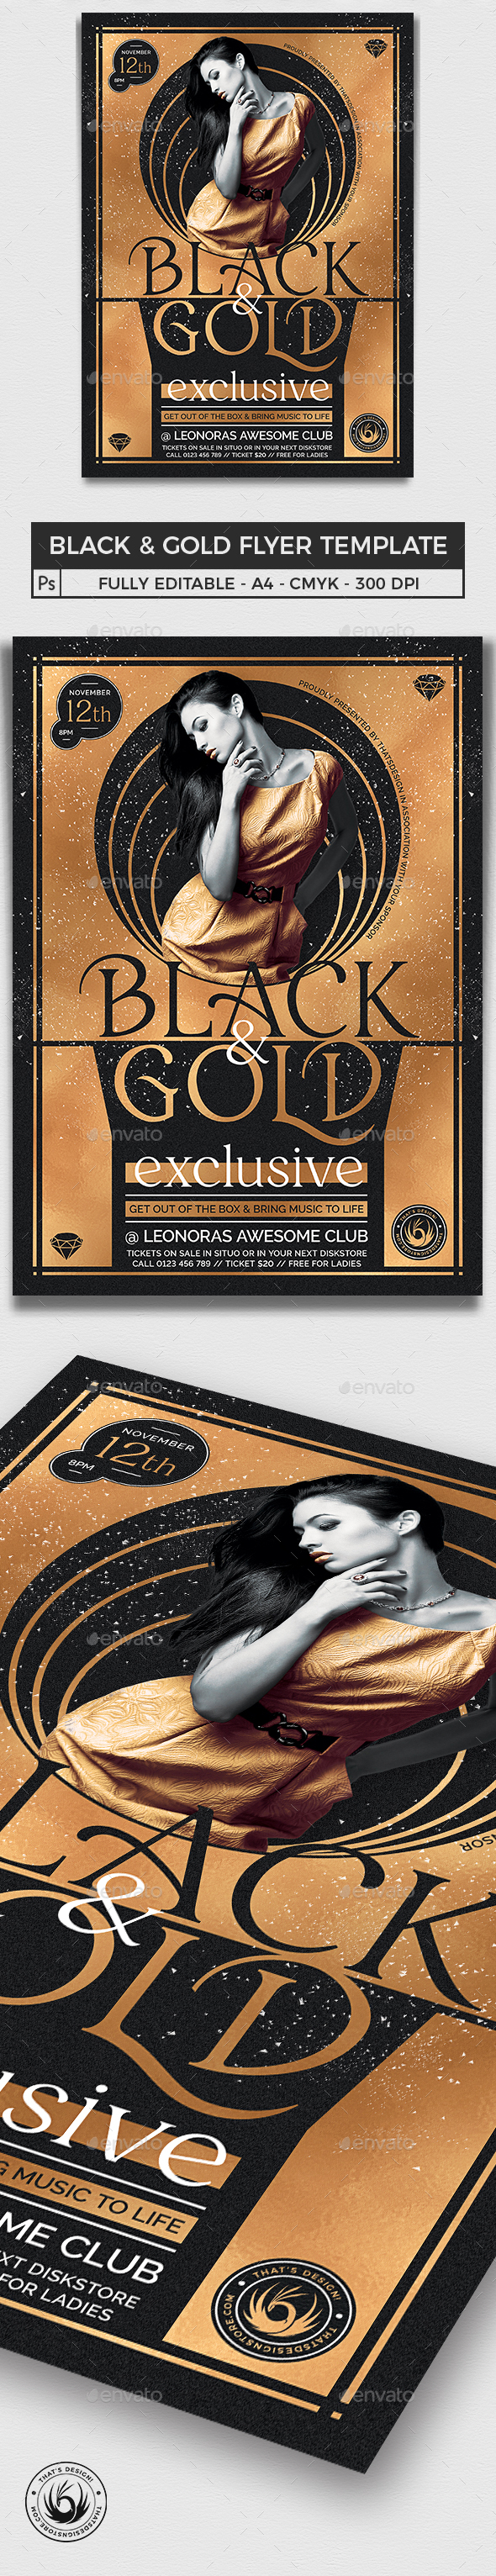 Black and Gold Flyer Template V20